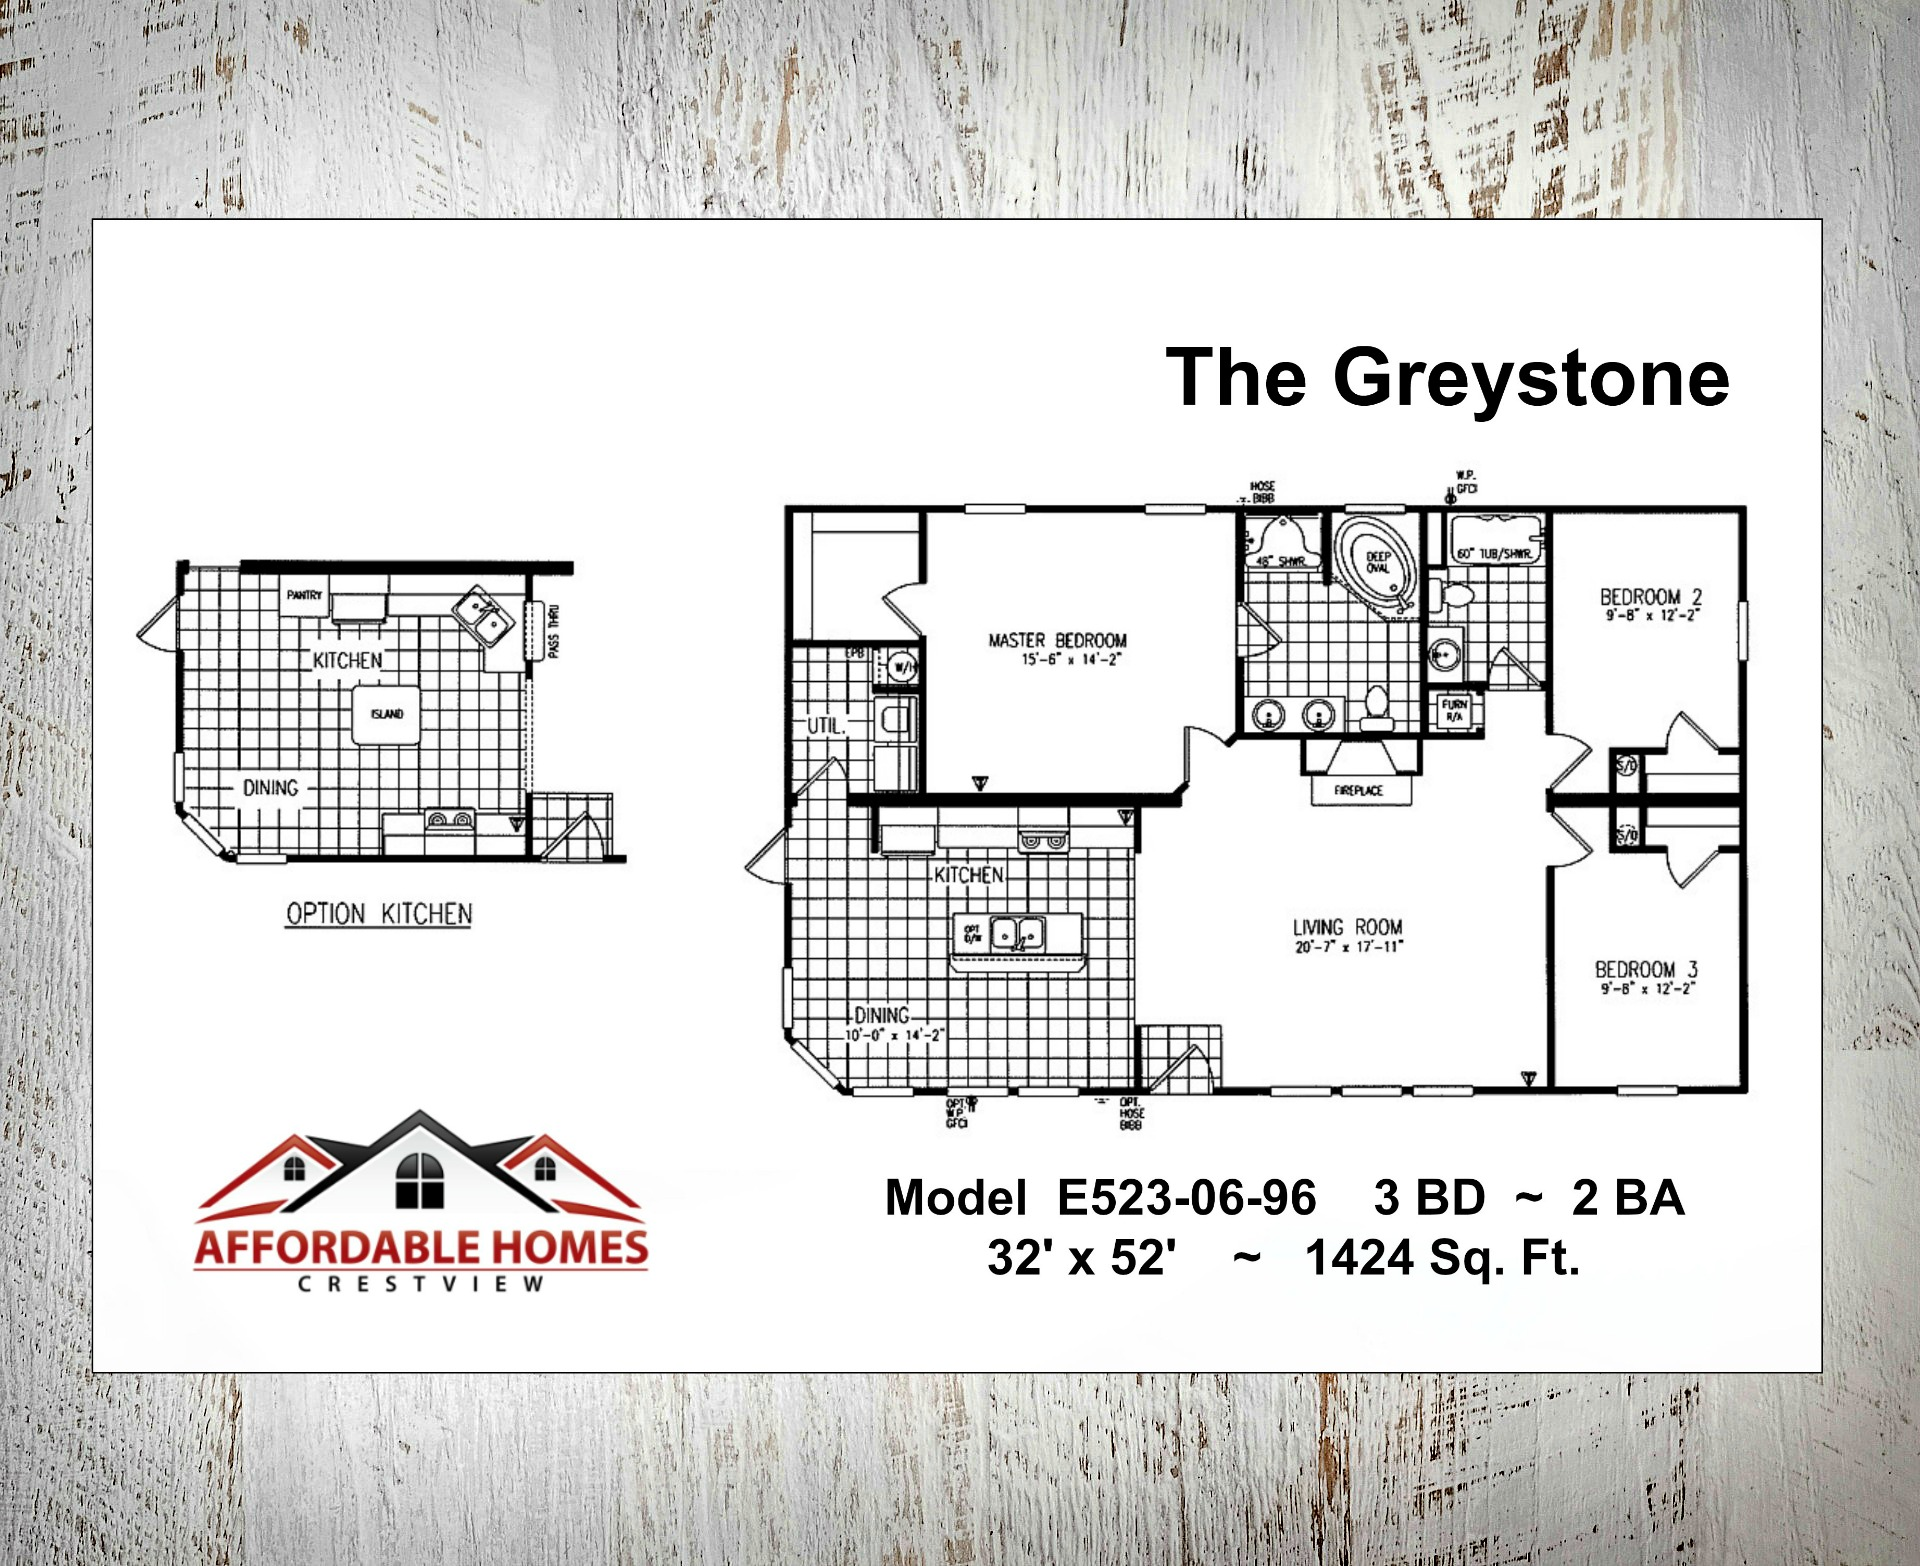 The Greystone Floorplan